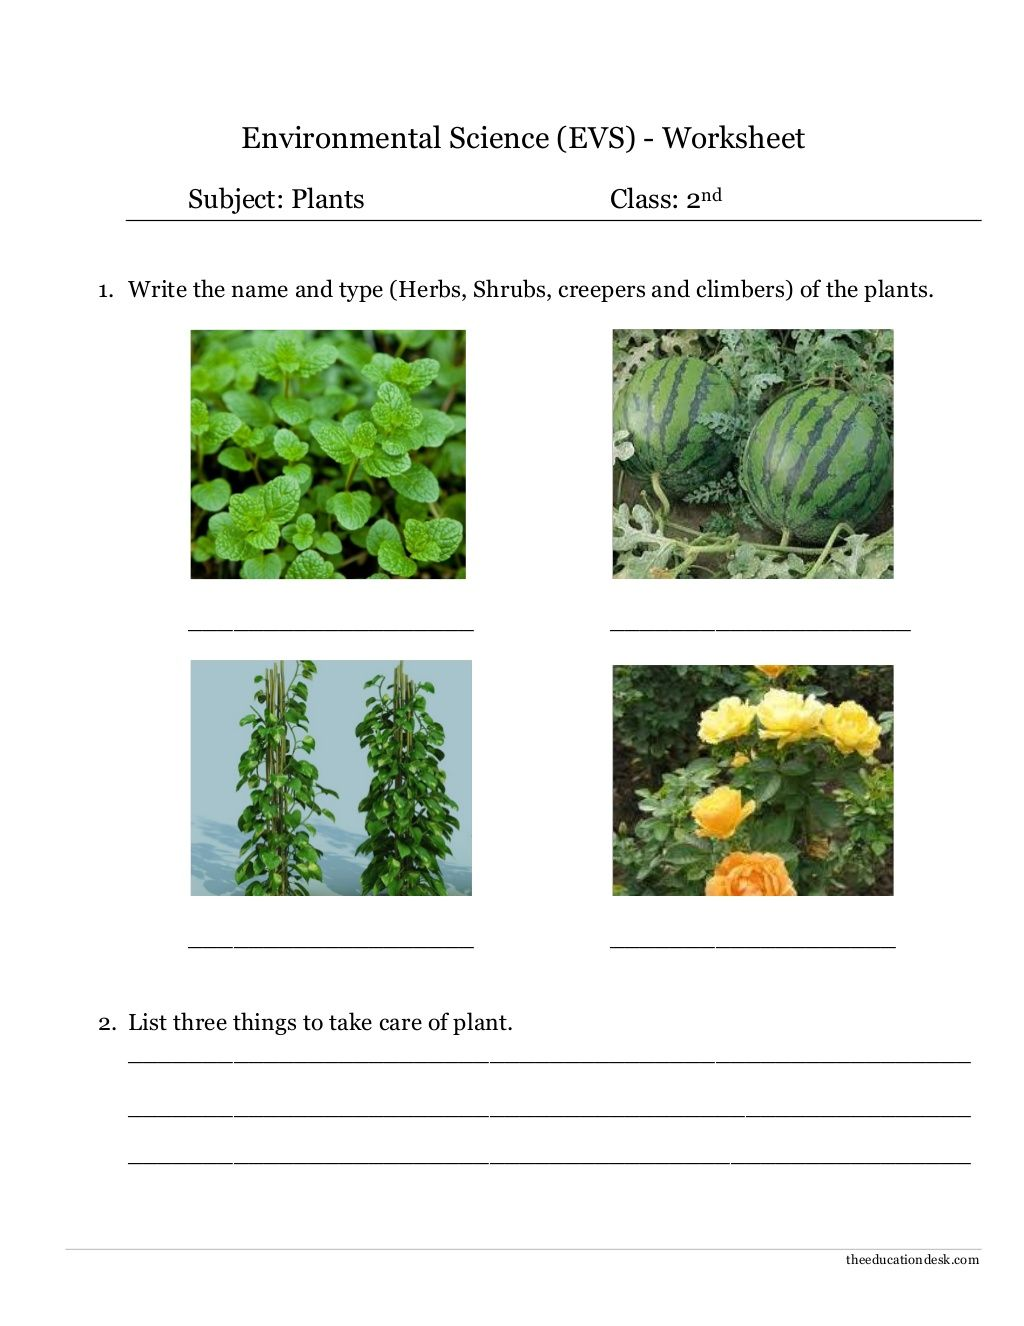 Environmental Science Evs Plants Worksheet Class Ii By Theeducationdesk Via Slideshare